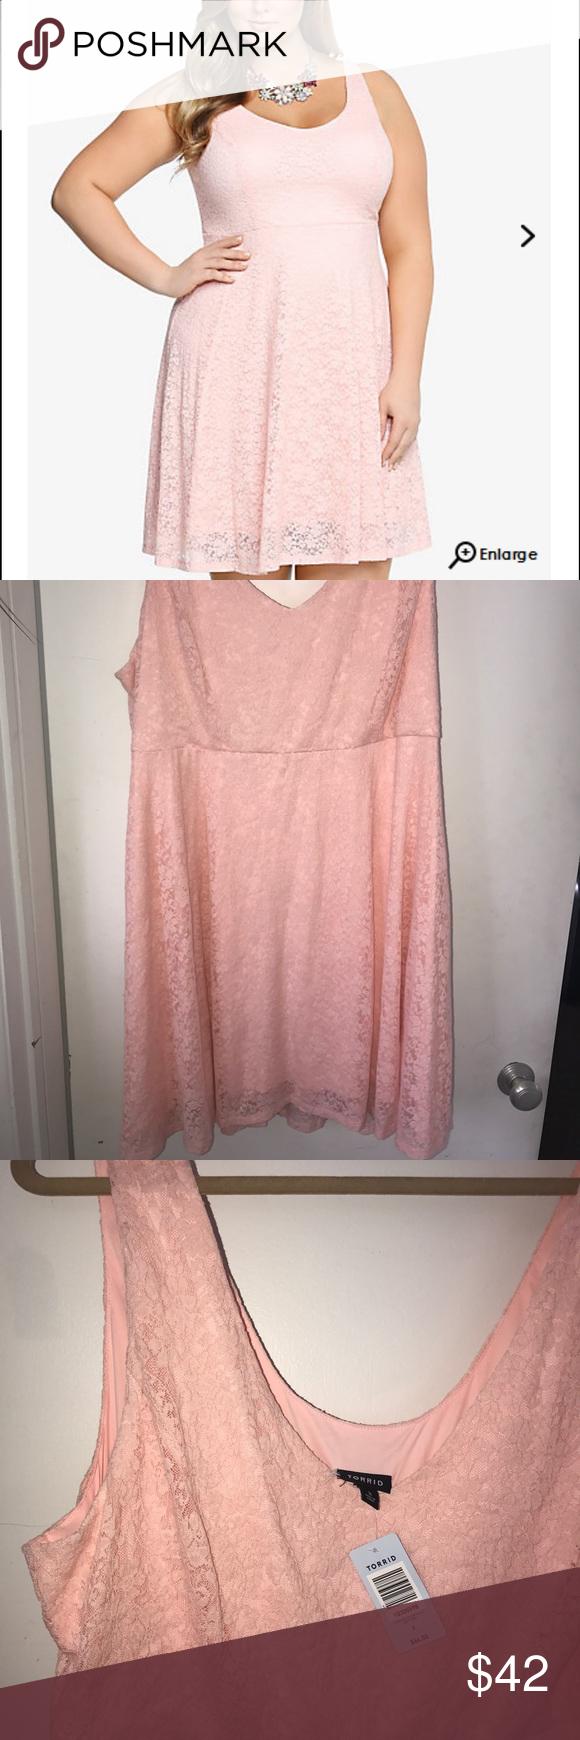 Torrid lace dress NWT soft pink lace tank dress torrid Dresses